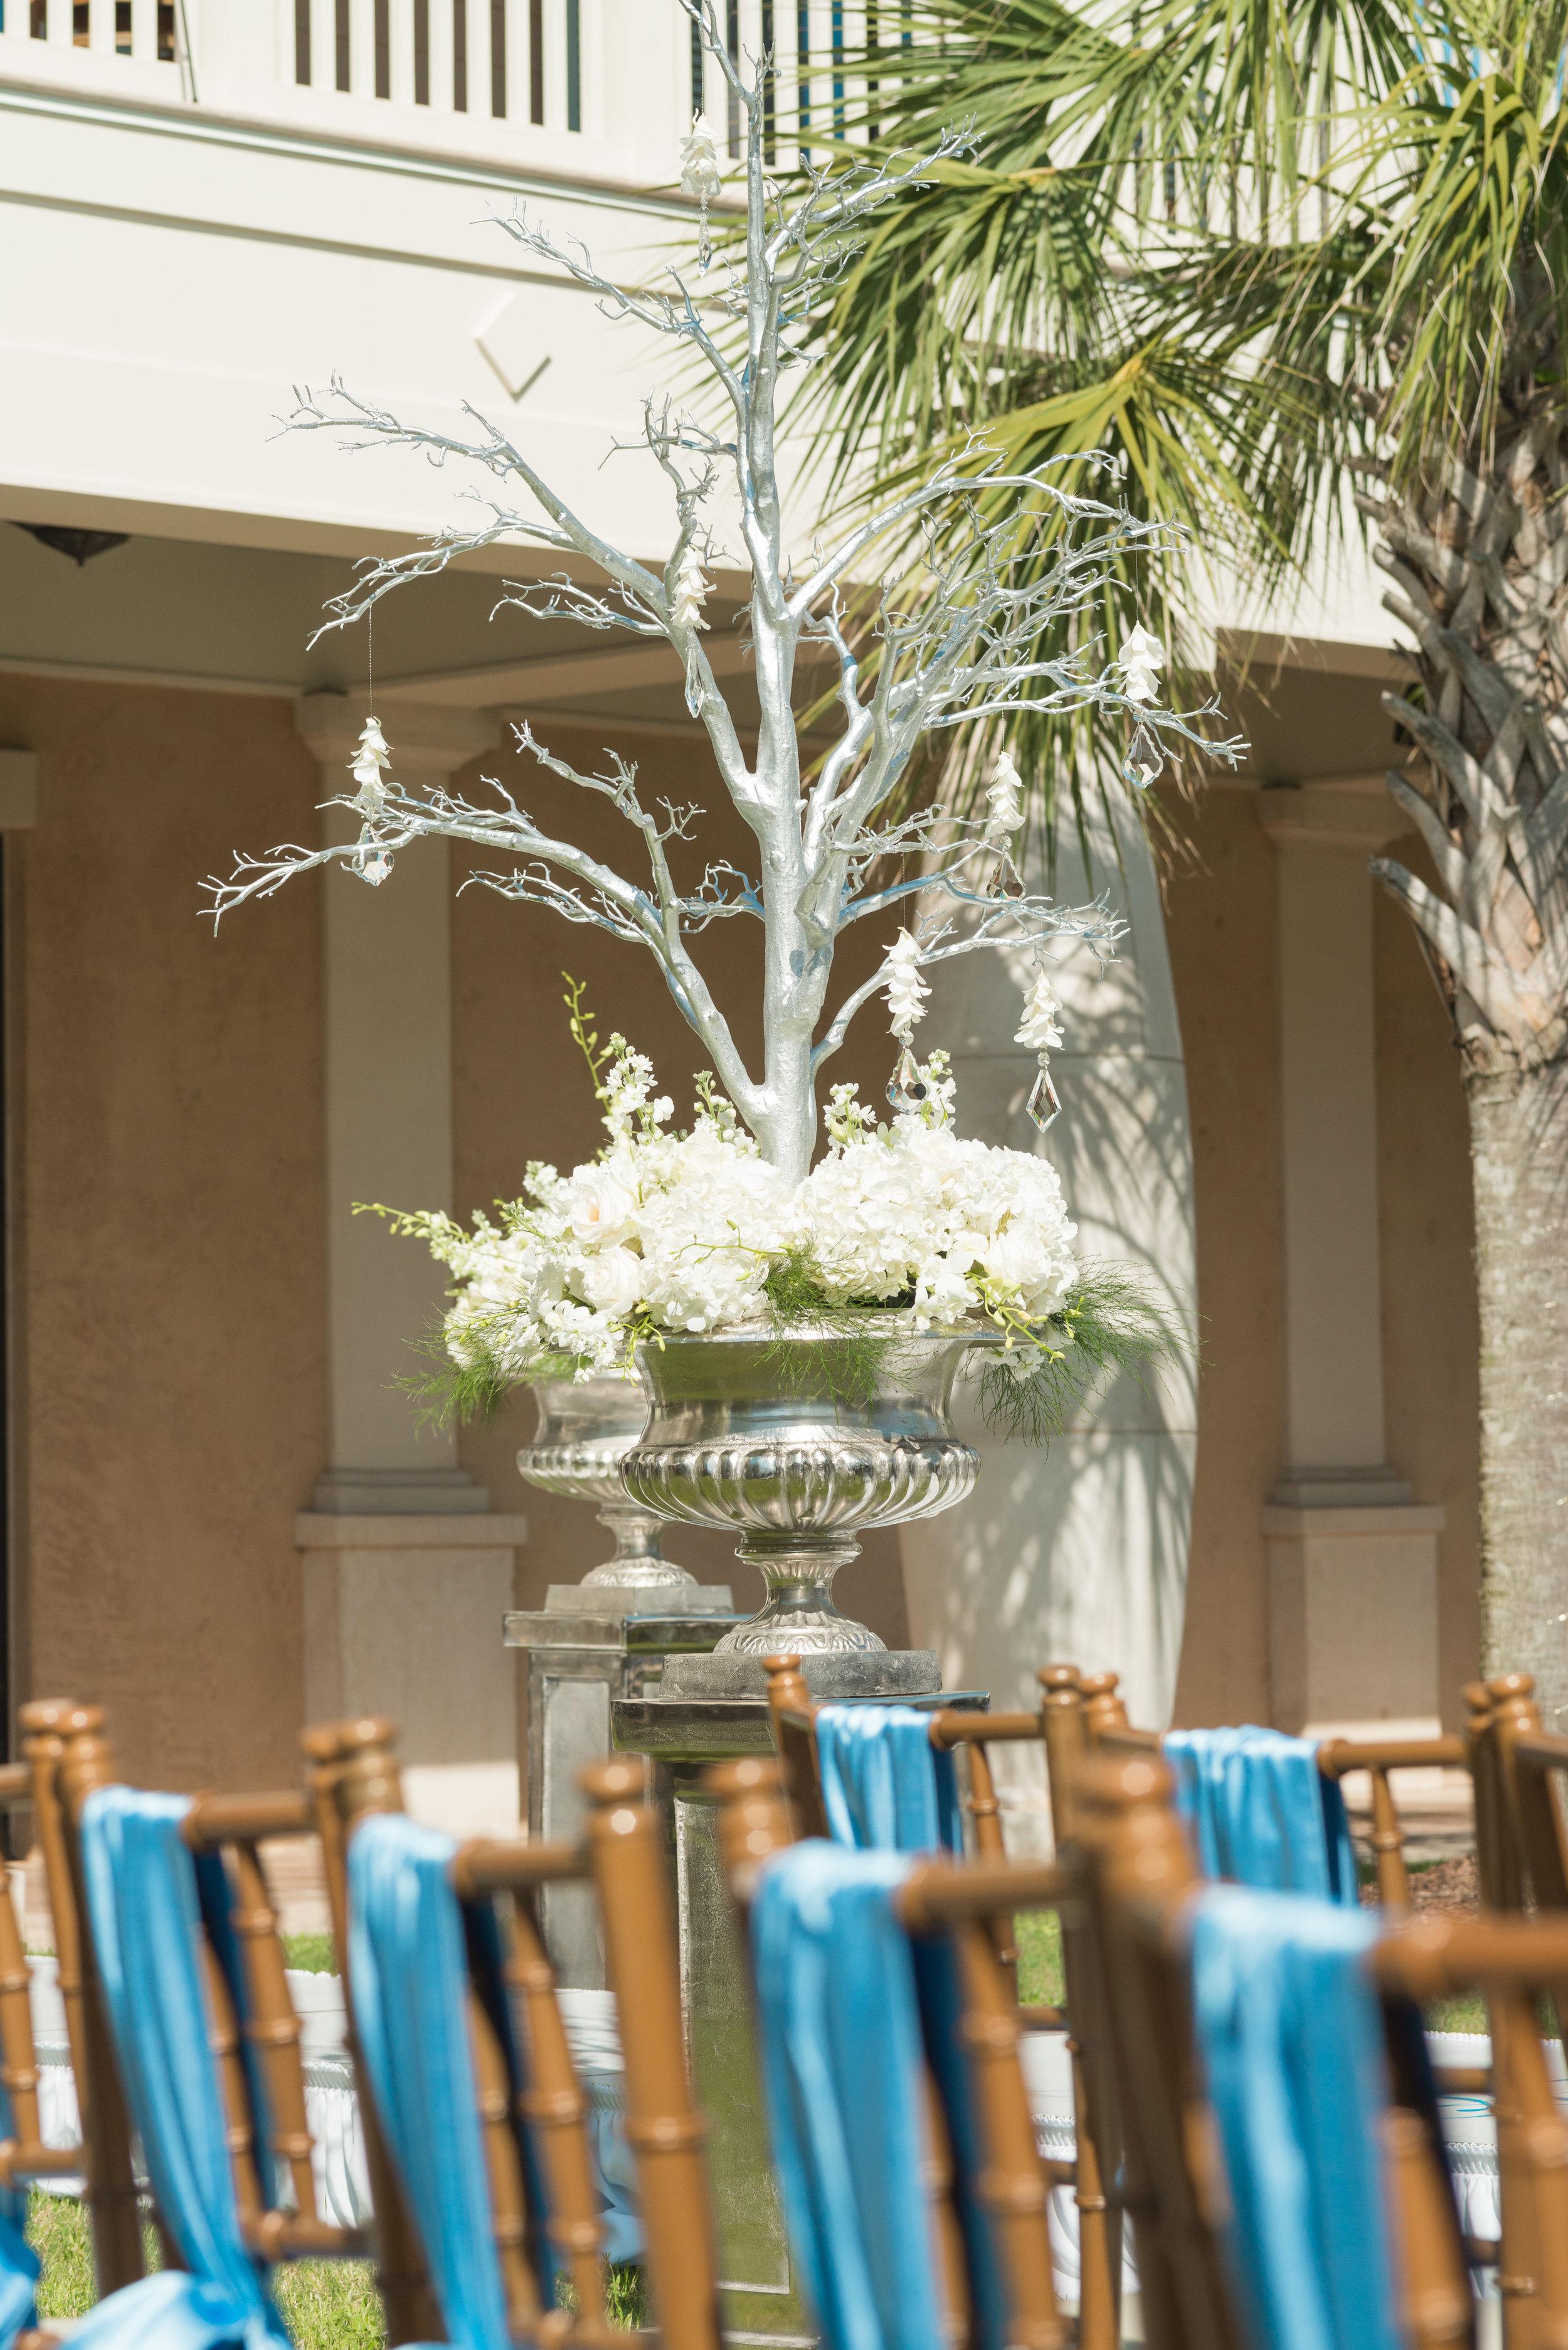 Carl-Kerridge-Photography-North-Beach-Wedding-May-2015-041.jpg